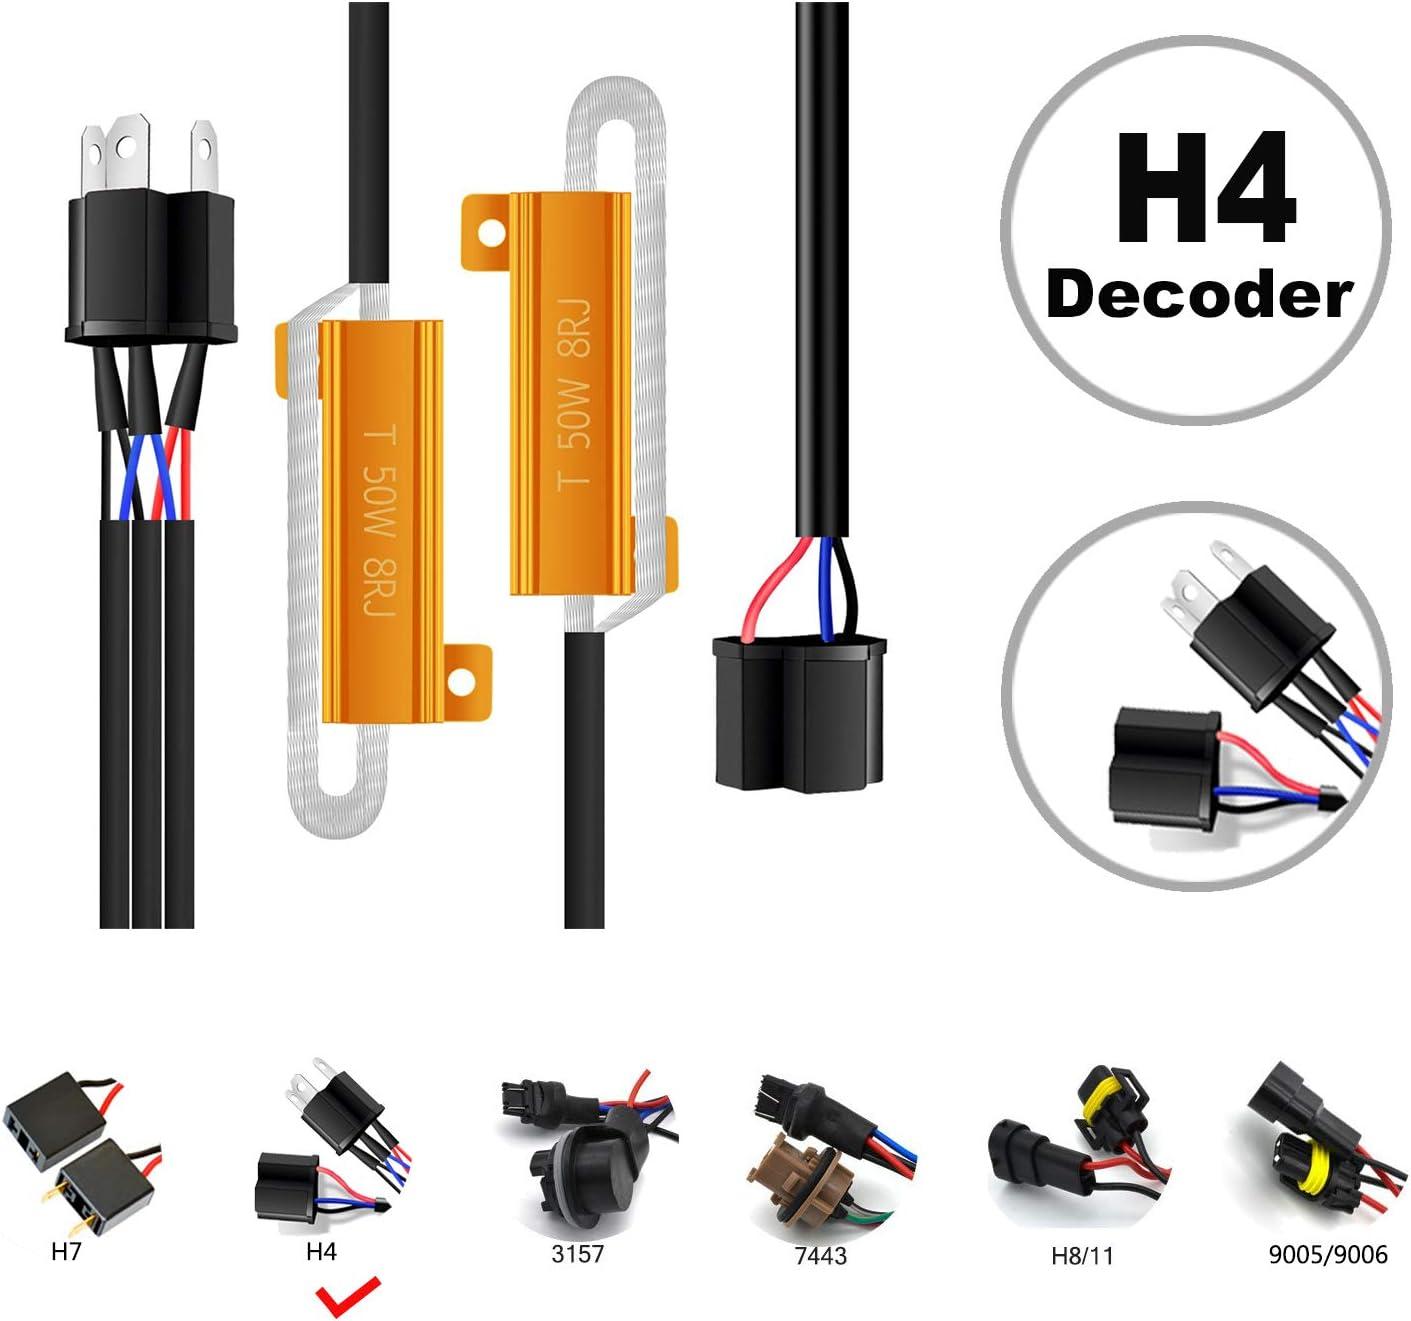 HOCOLO/_2pcs H4-Resistor Decoder HOCOLO H4 9003 HB2 LED Resistor Kit Relay Harness Adapter Anti Flicker Error Decoder Warning Canceller